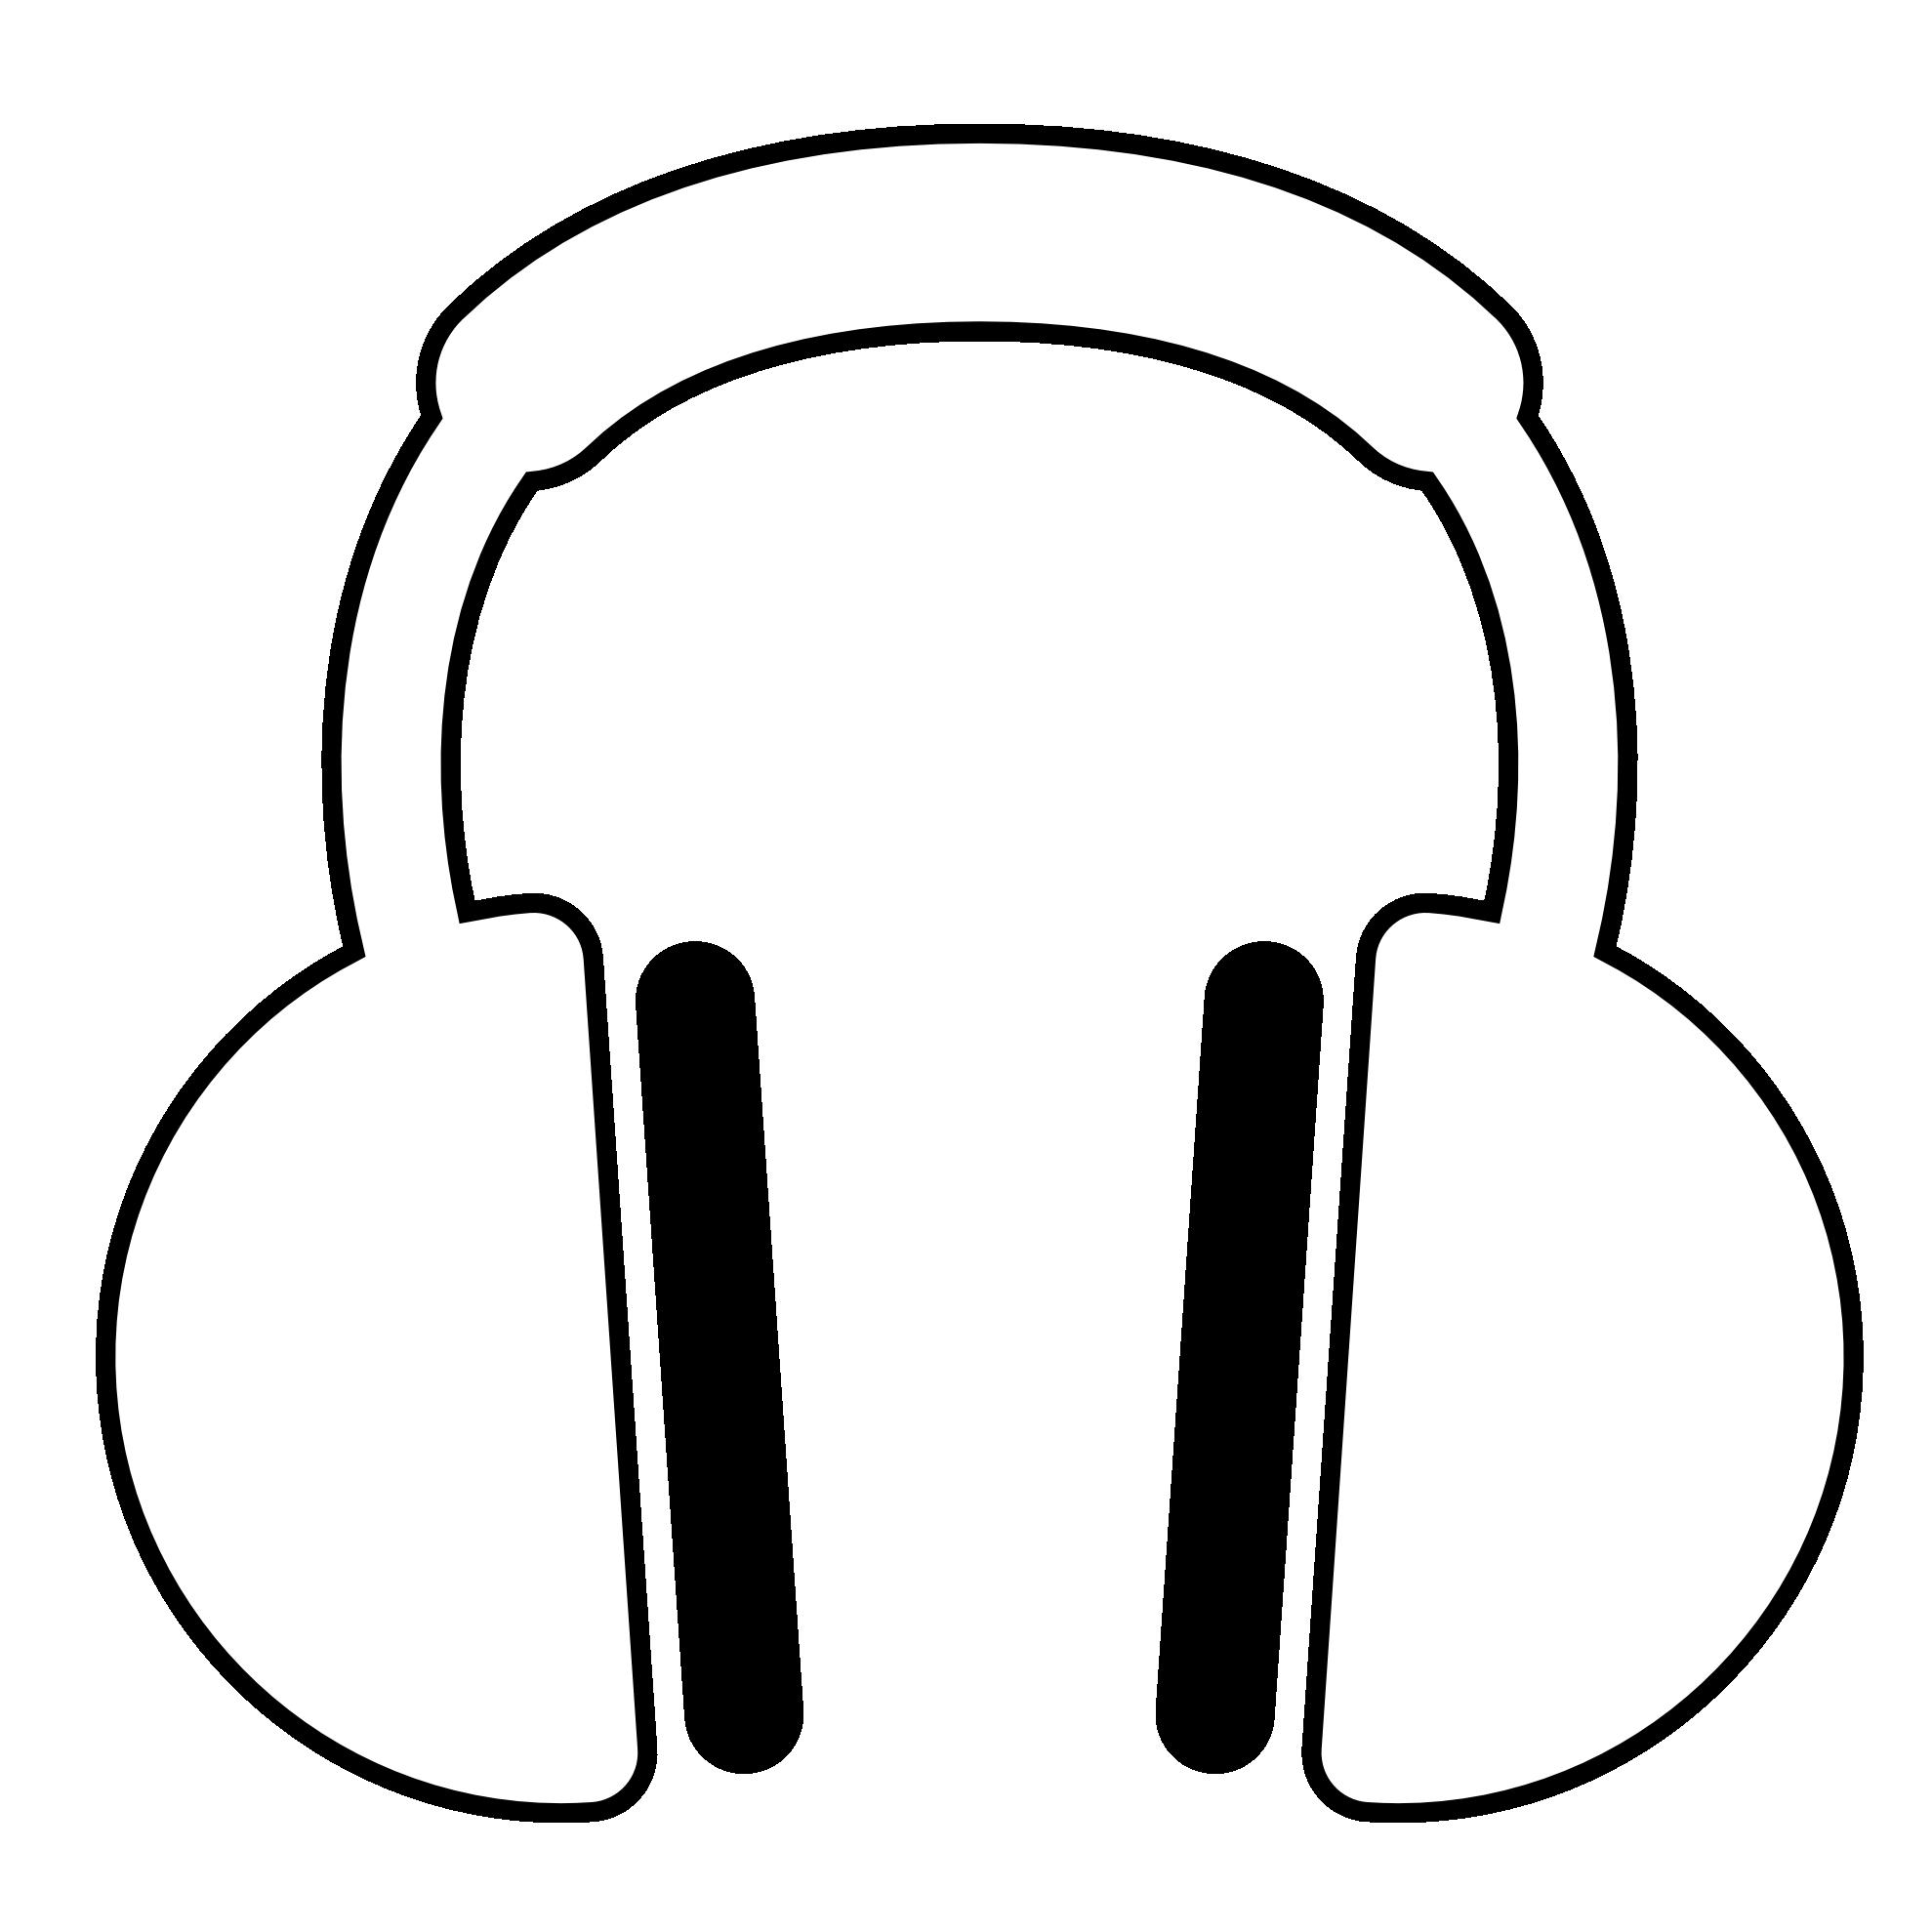 Headphone clipart drawn Black Headphones Clip Line Colouring